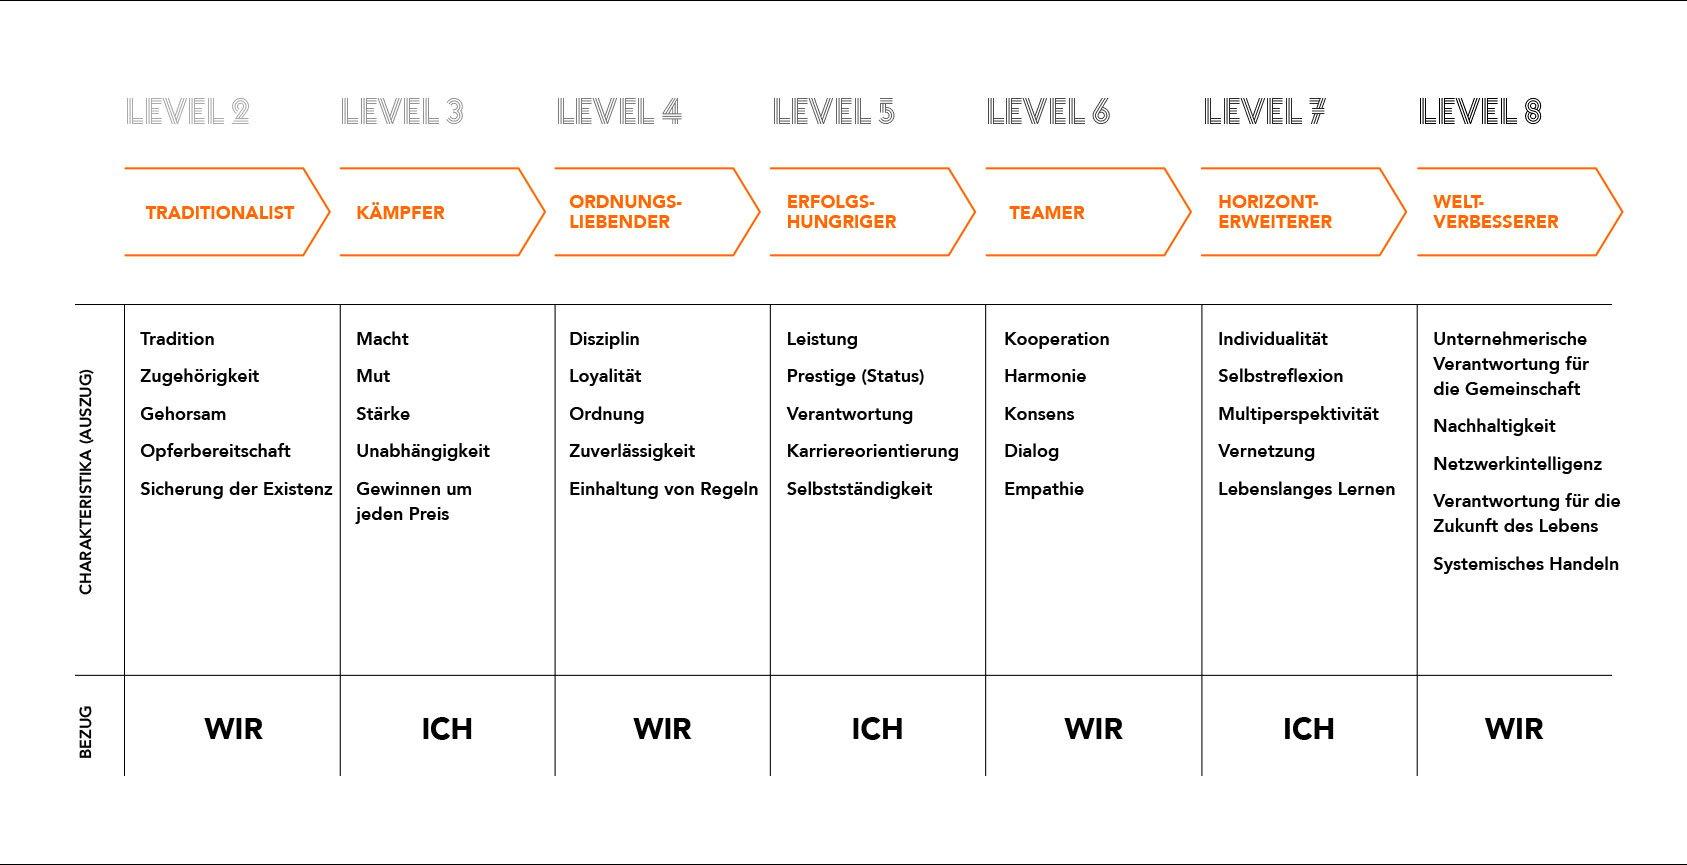 Unternehmenskultur im Wandel_1687x865_Grafik 9-Levels-Werte